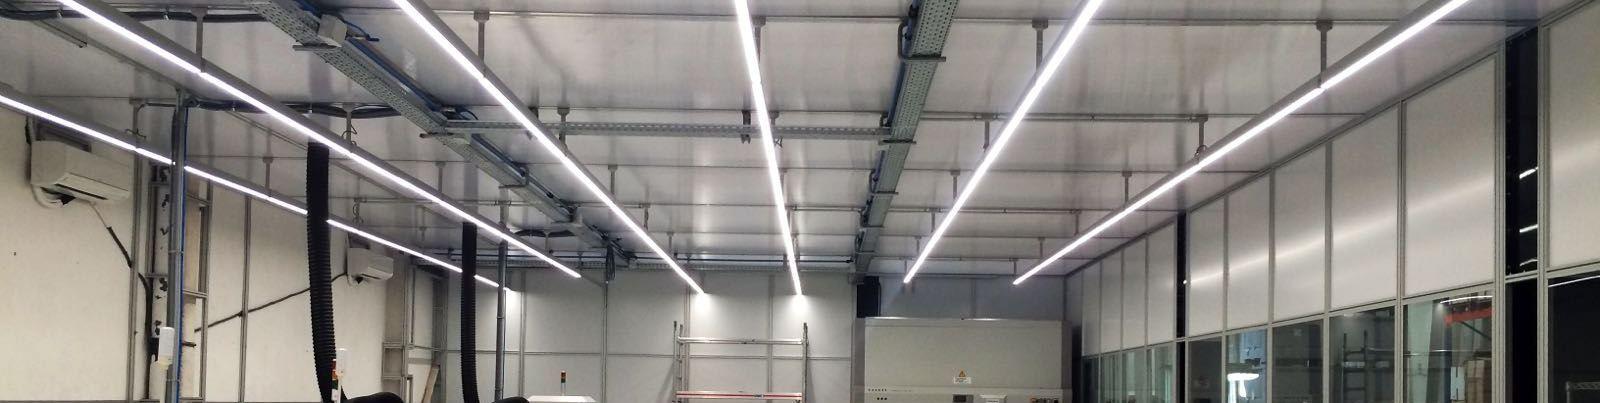 LED Lichtlijnen bij Sakma